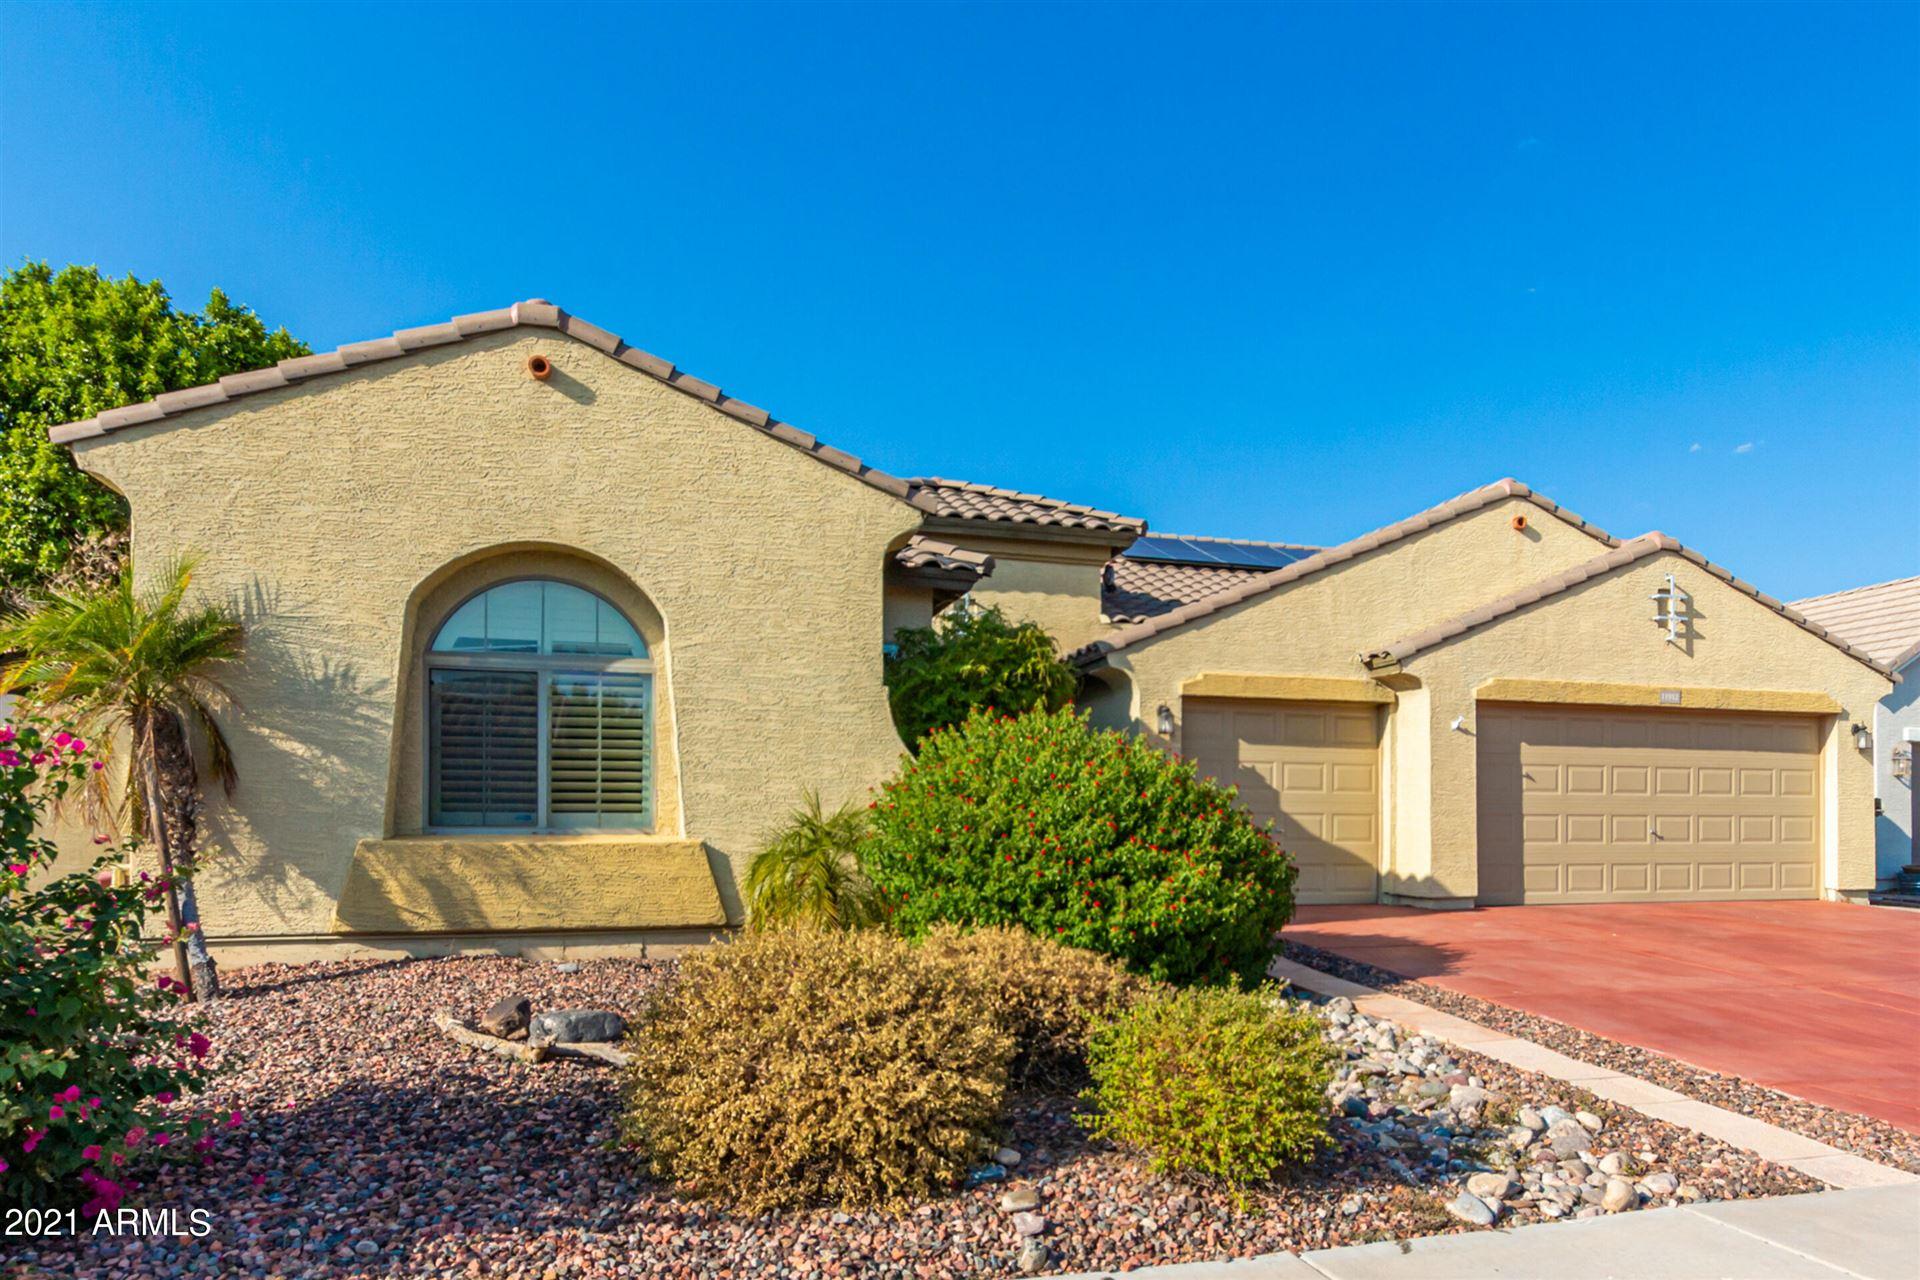 Photo of 11912 W JESSIE Lane, Sun City, AZ 85373 (MLS # 6294988)